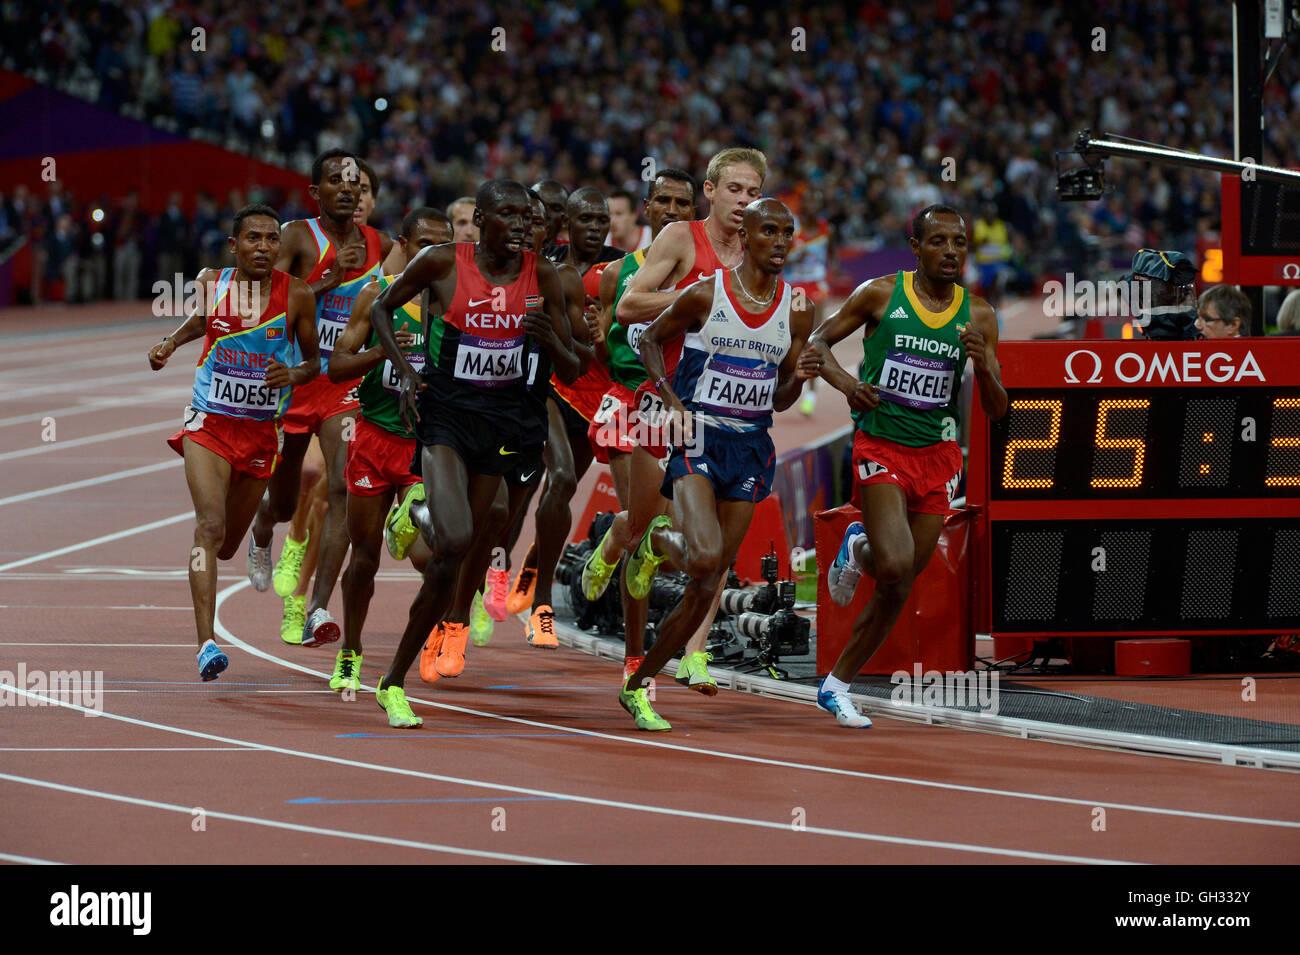 London 2012  - Olympics:   Athletics - Men's 10,000 Meter final.  Mohamed Farah of Great Britain winning the - Stock Image